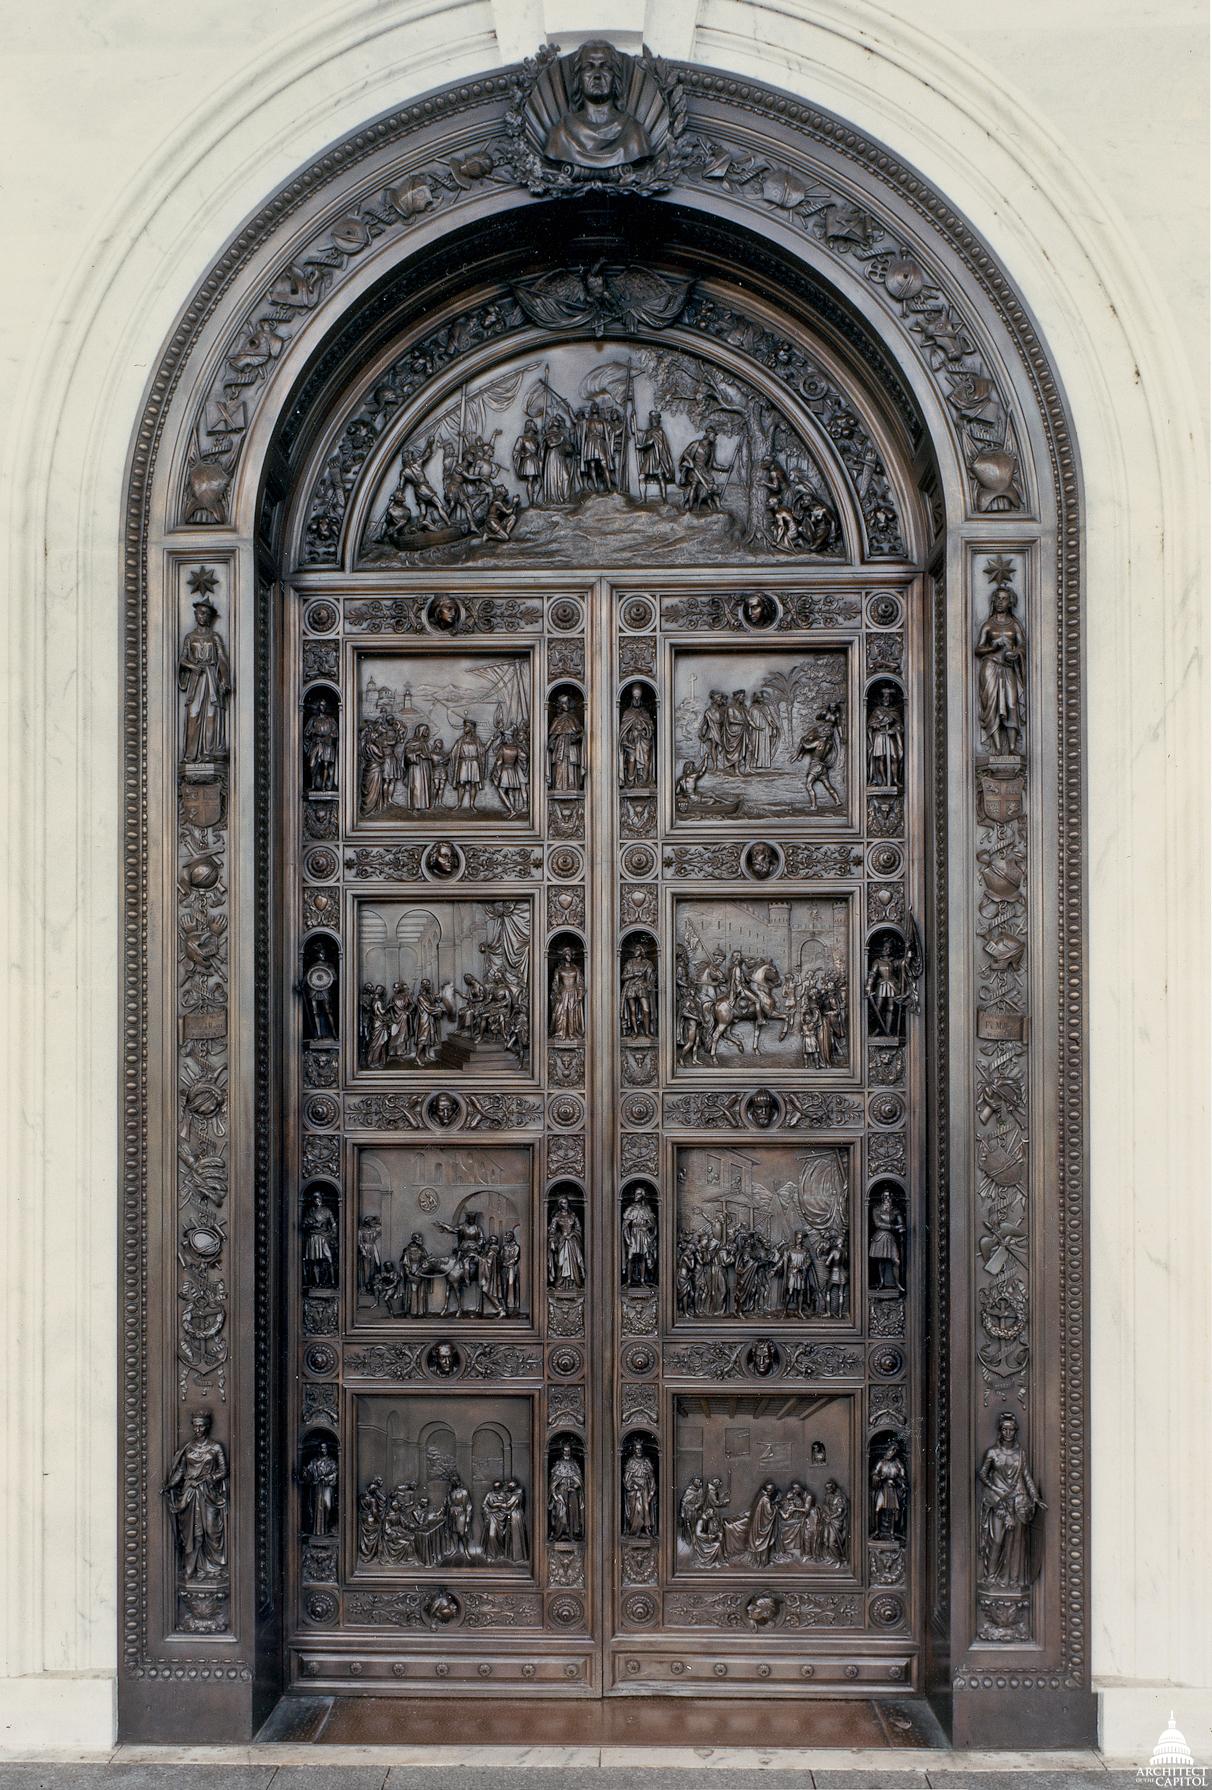 FileFlickr - USCapitol - Columbus Doors.jpg & File:Flickr - USCapitol - Columbus Doors.jpg - Wikimedia Commons